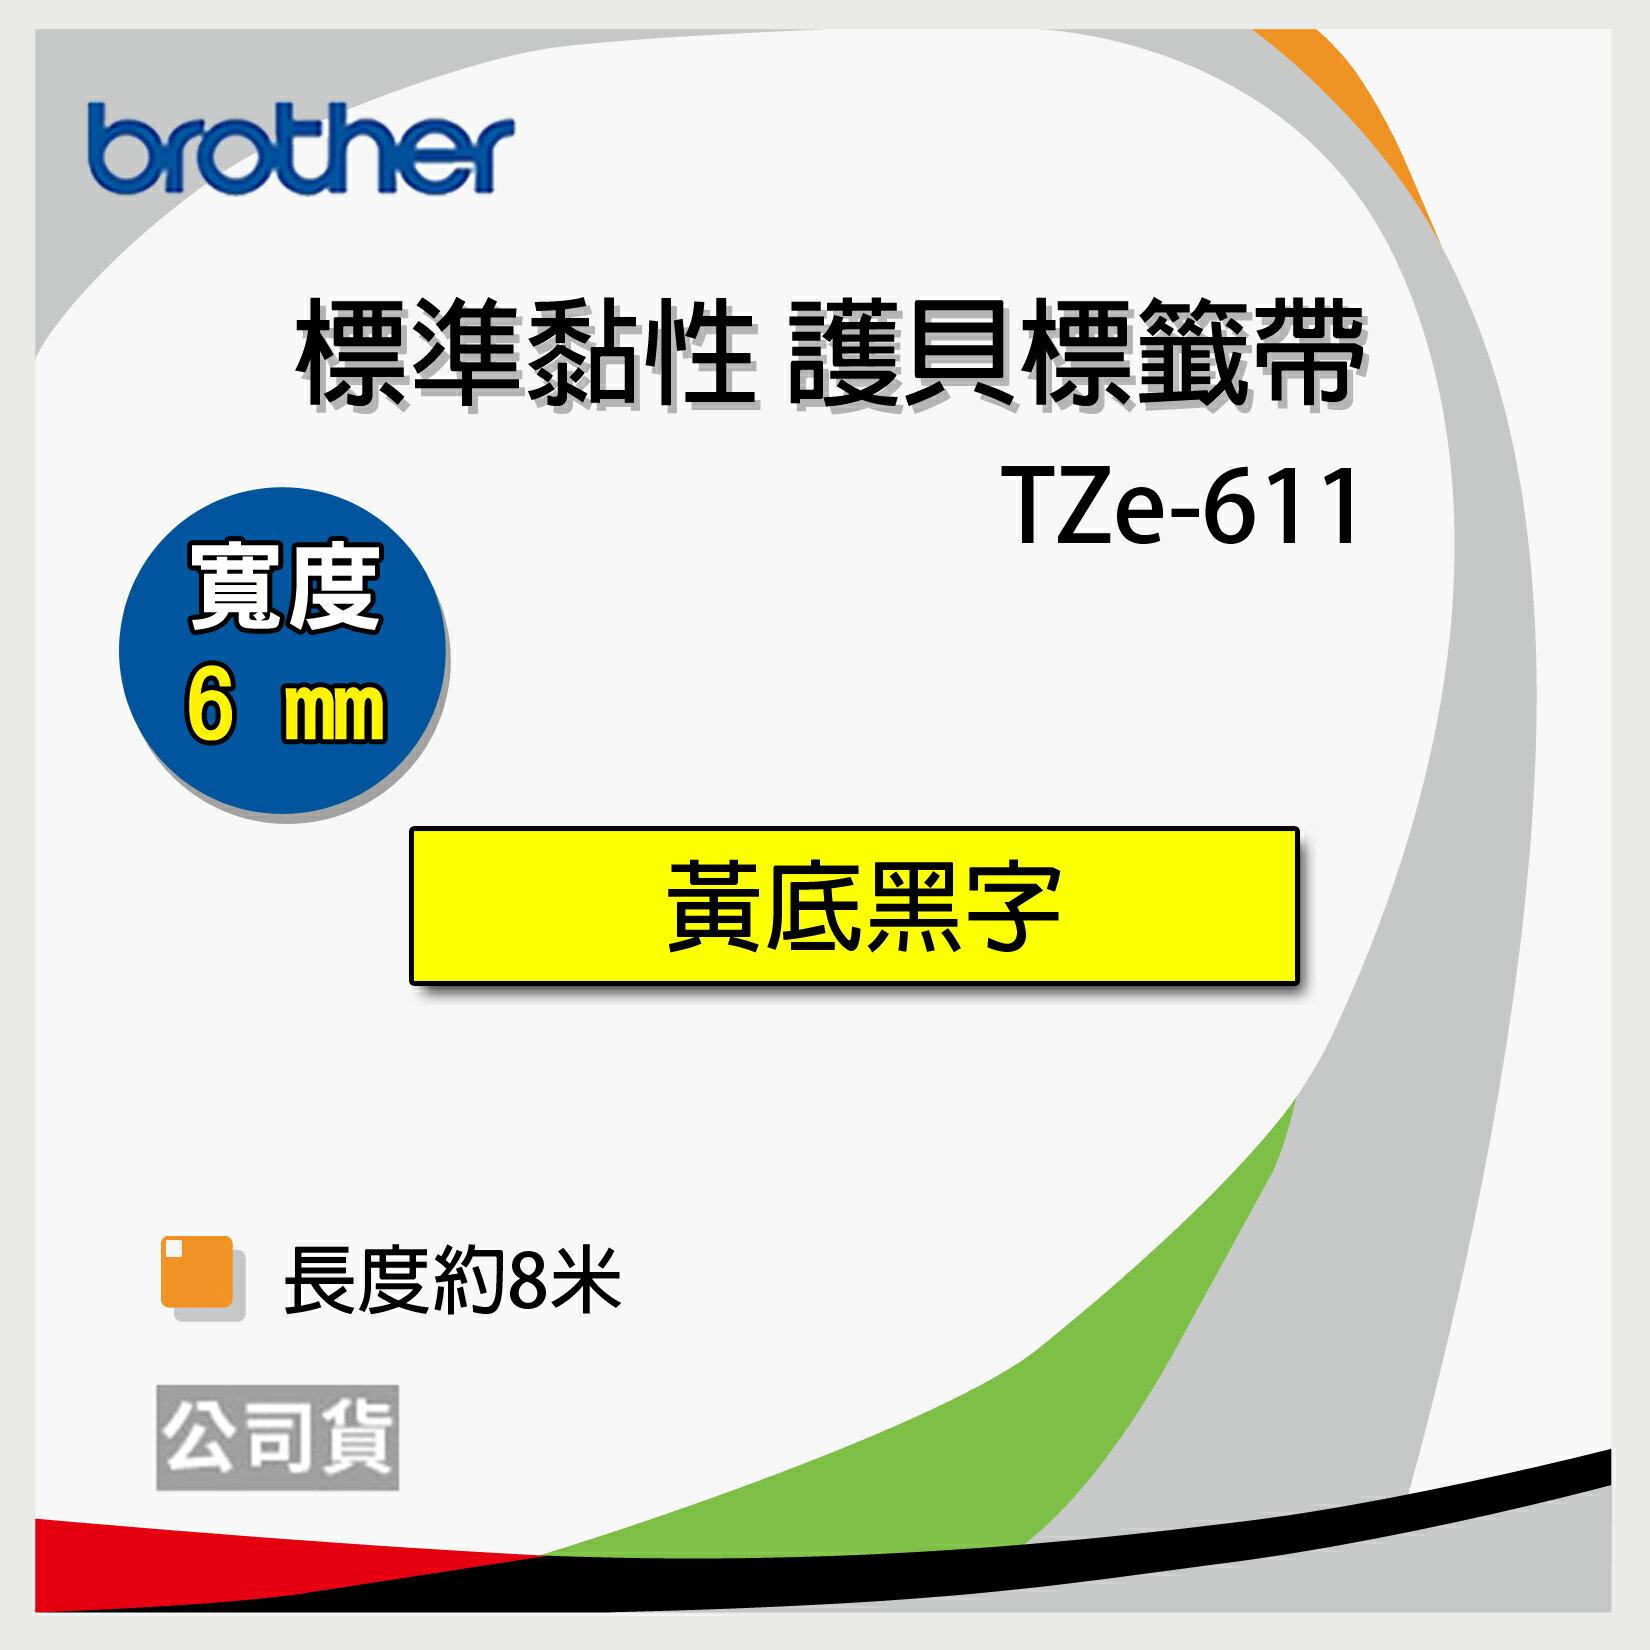 Brother 6mm 原廠護貝標籤帶 TZe-611 / TZ-611(黃底黑字)-長度8M